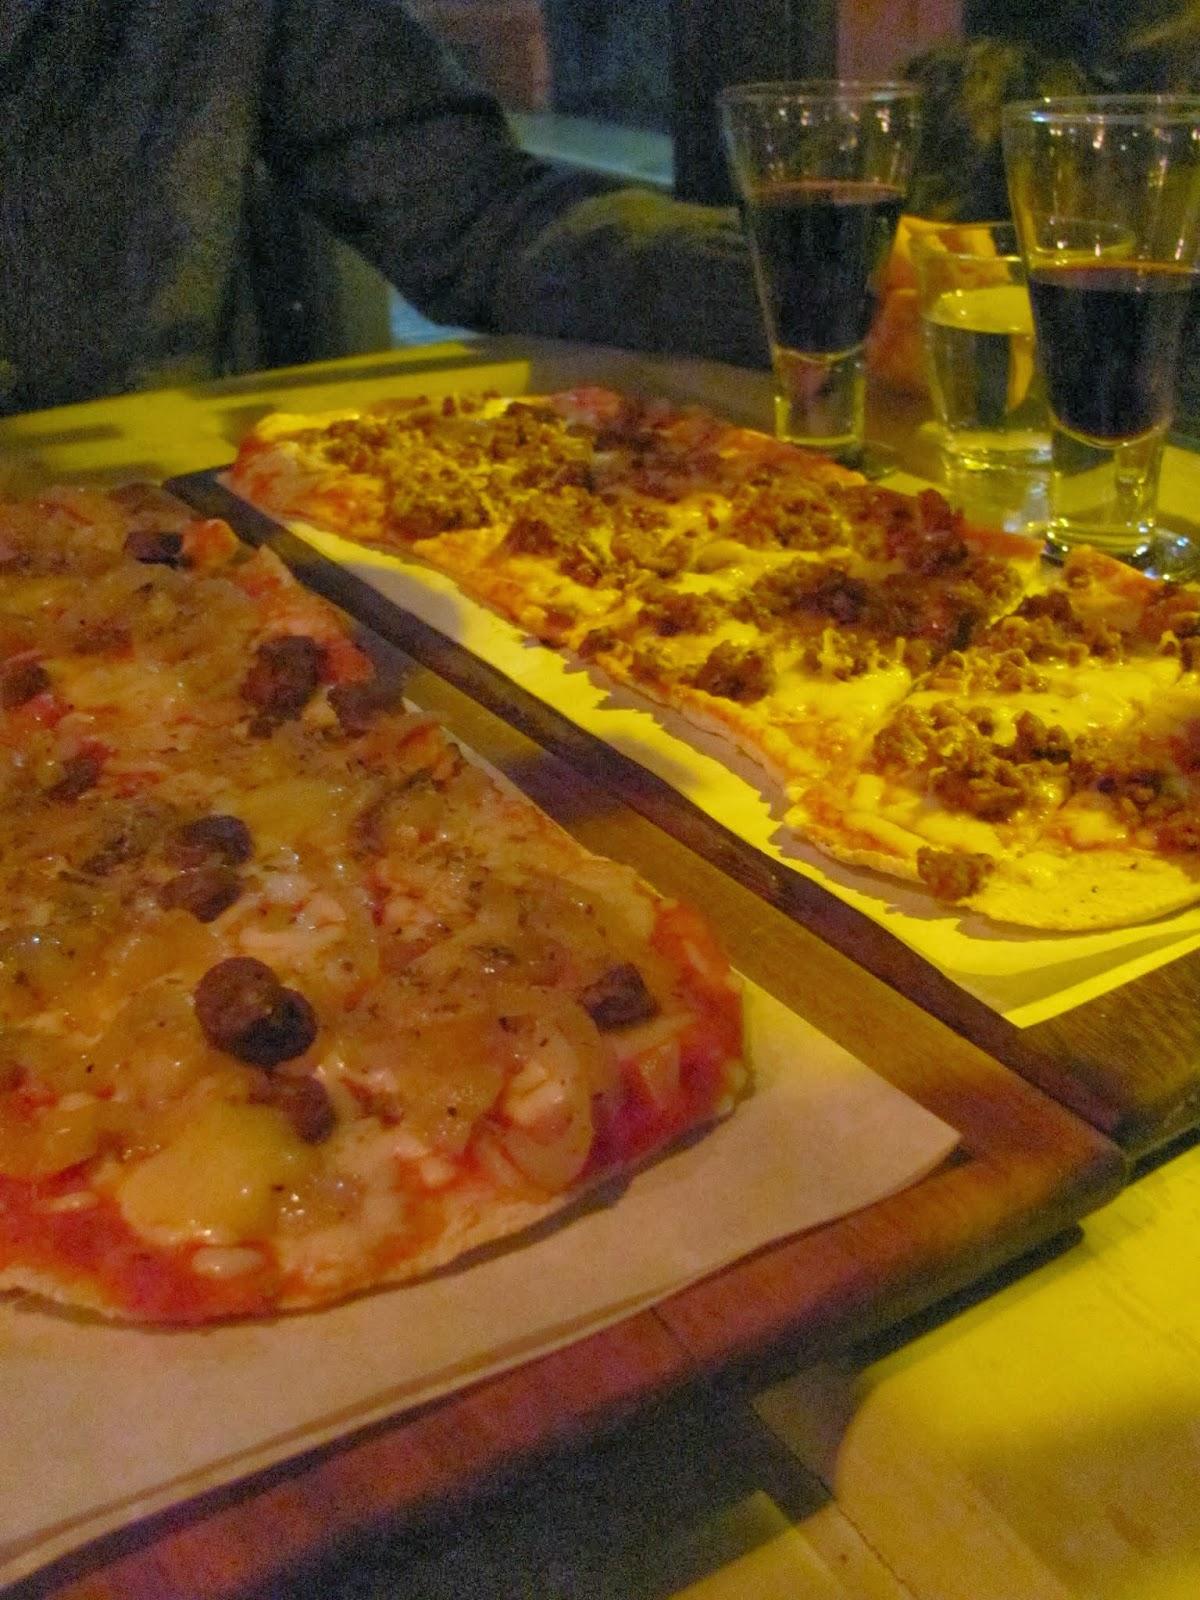 The Pizzas at Skinflint Dublin, Ireland